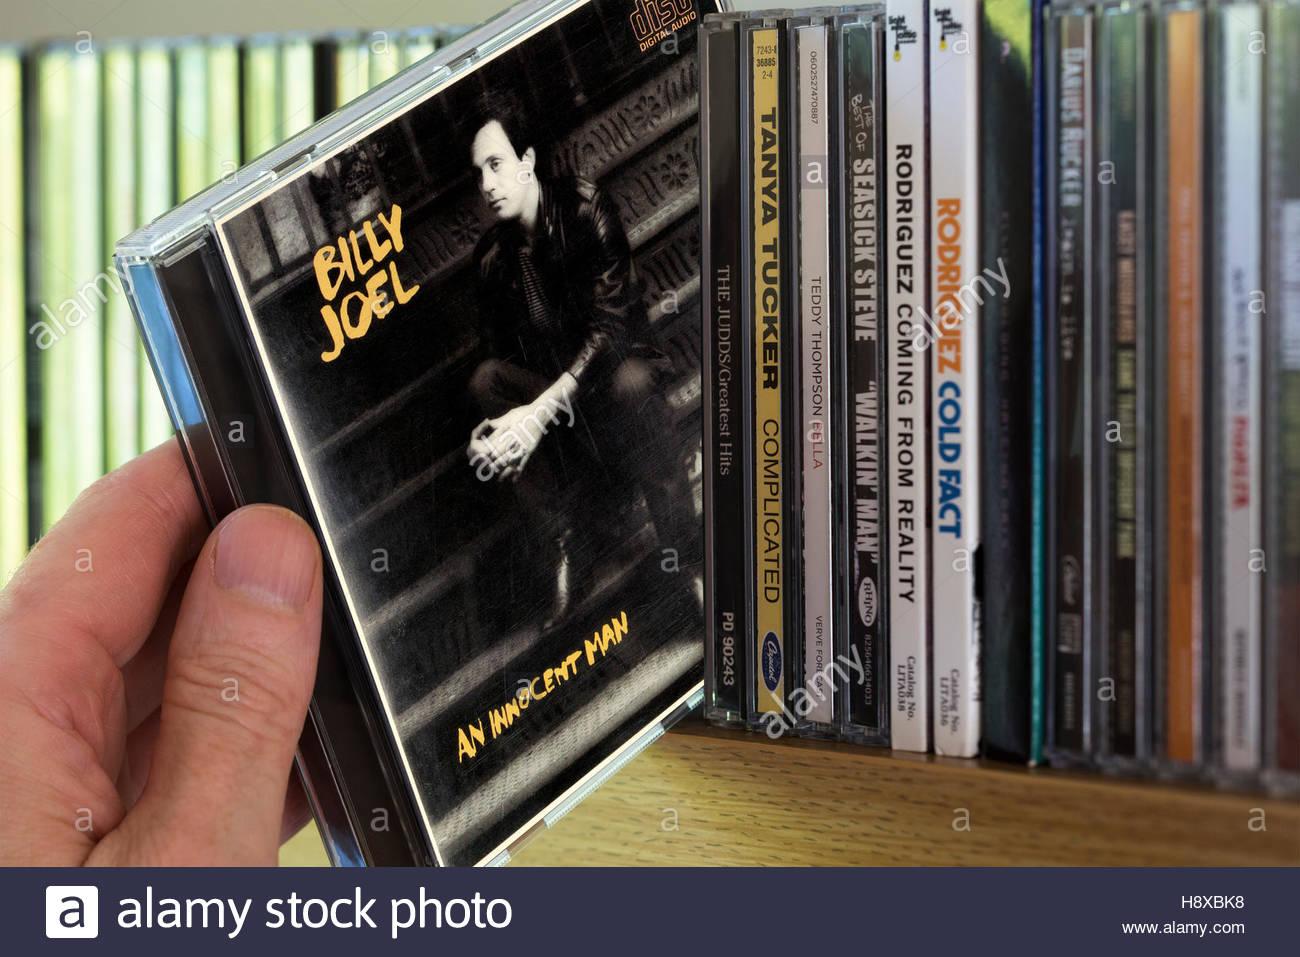 An Innocent Man, Billy Joel CD being chosen from a shelf of other CD's Stock Photo